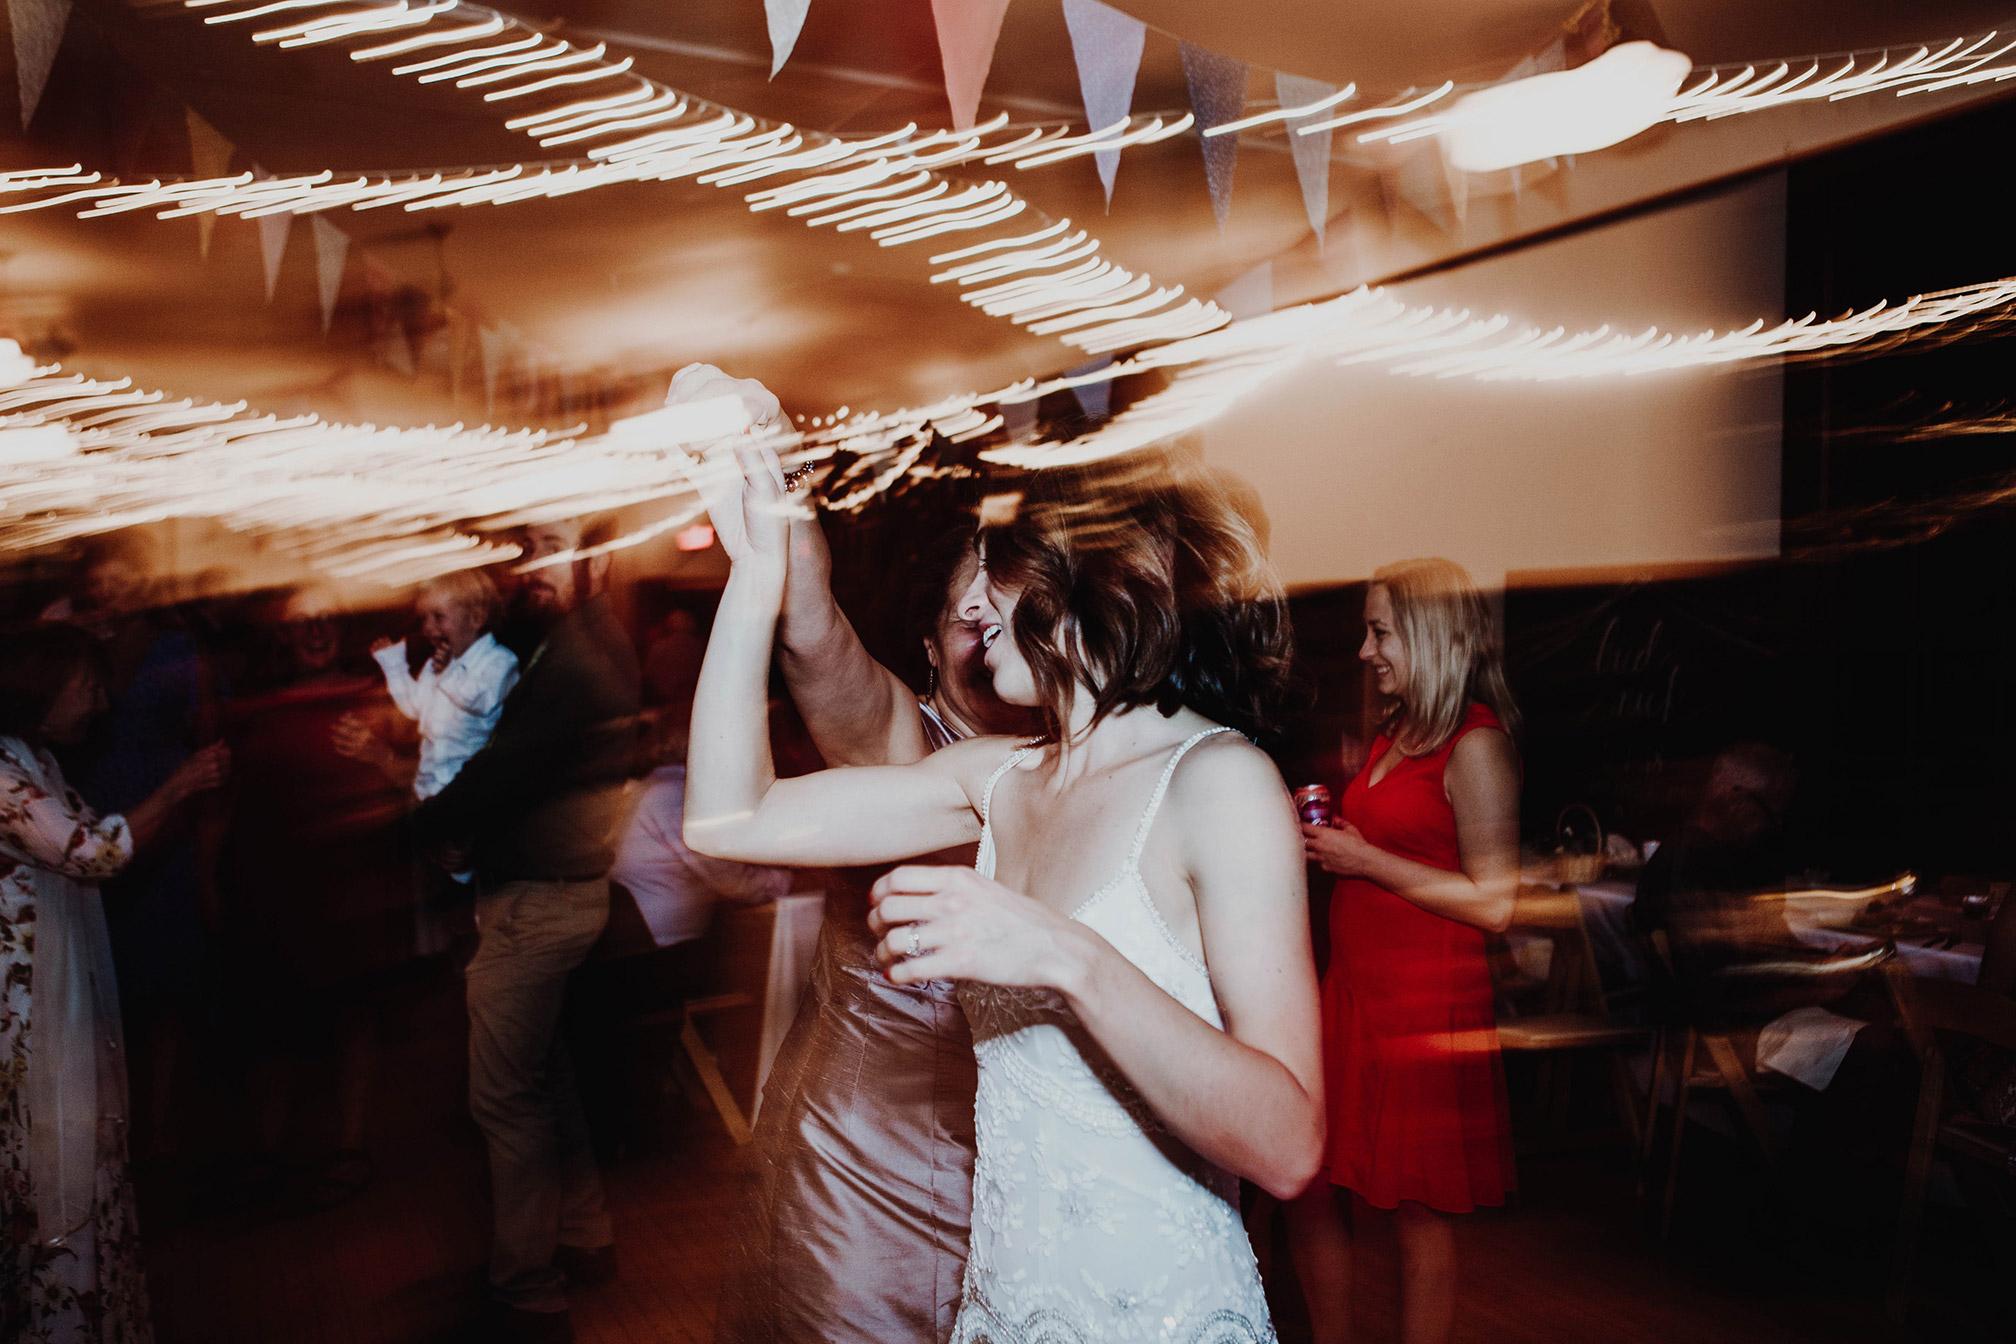 Robyn Nicole Film + Photo Couple Dancing at Wedding